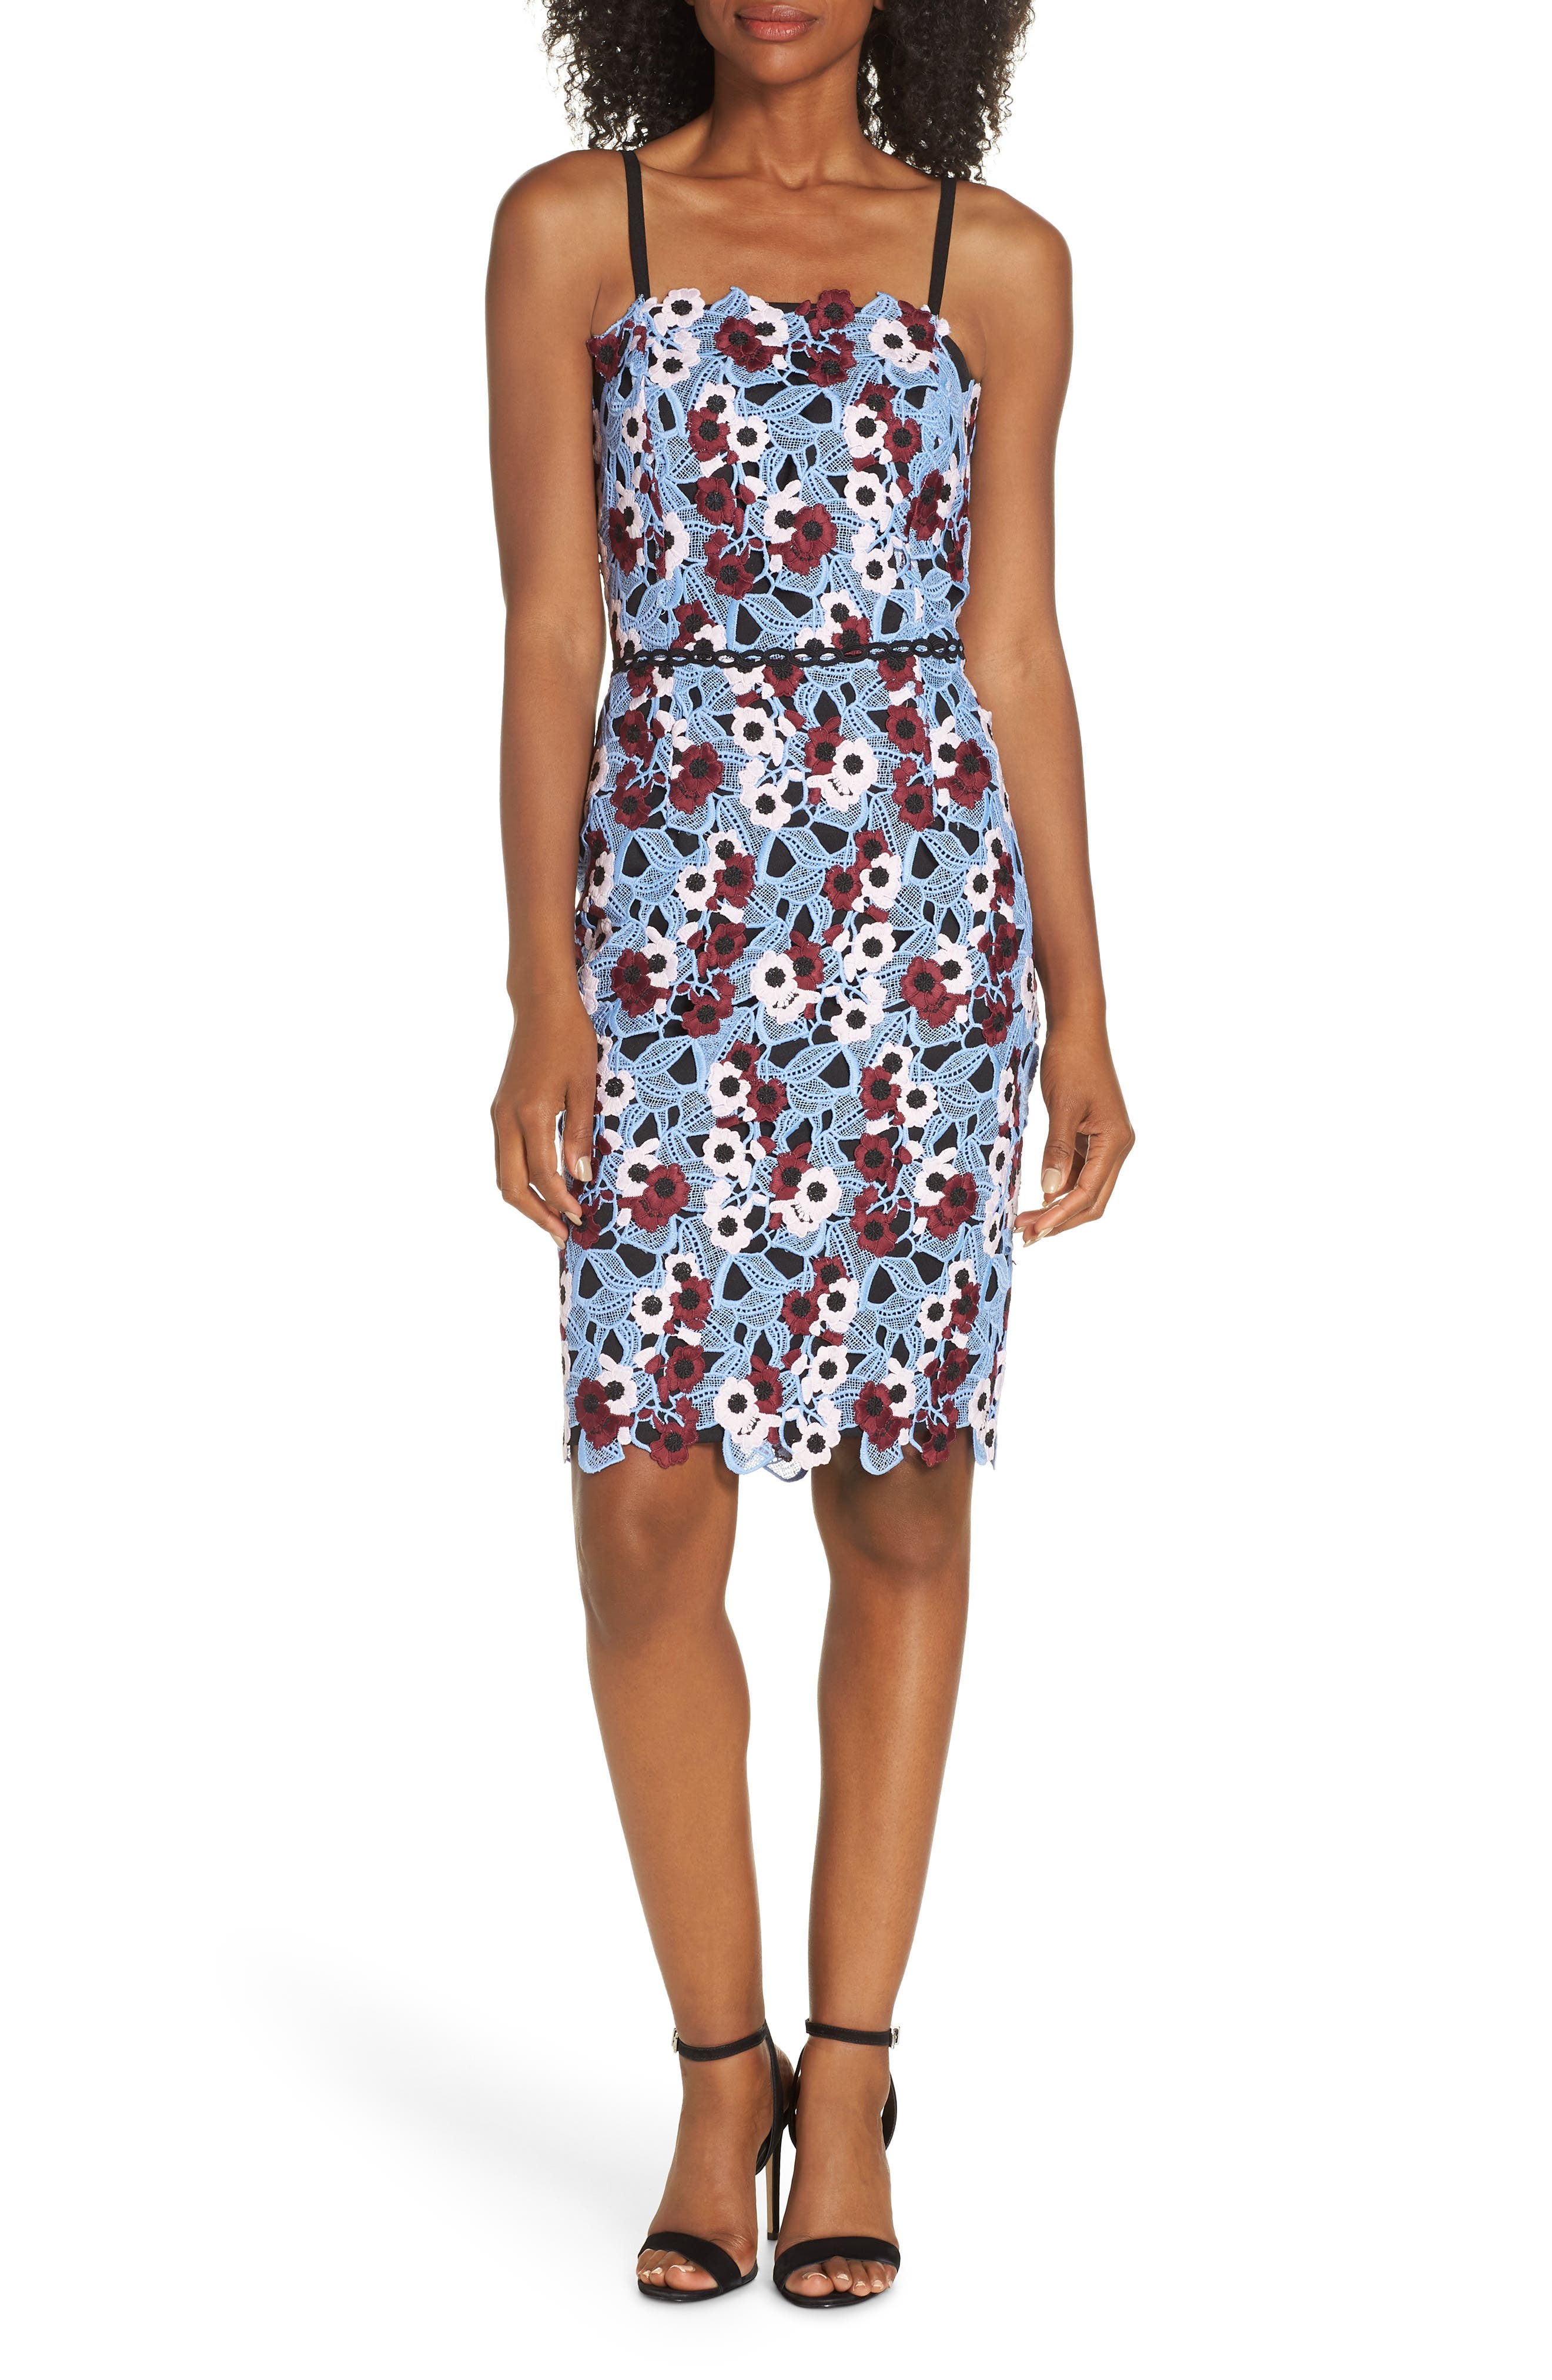 ADELYN RAE Harlow Lace Sheath Dress in Blue-Wine